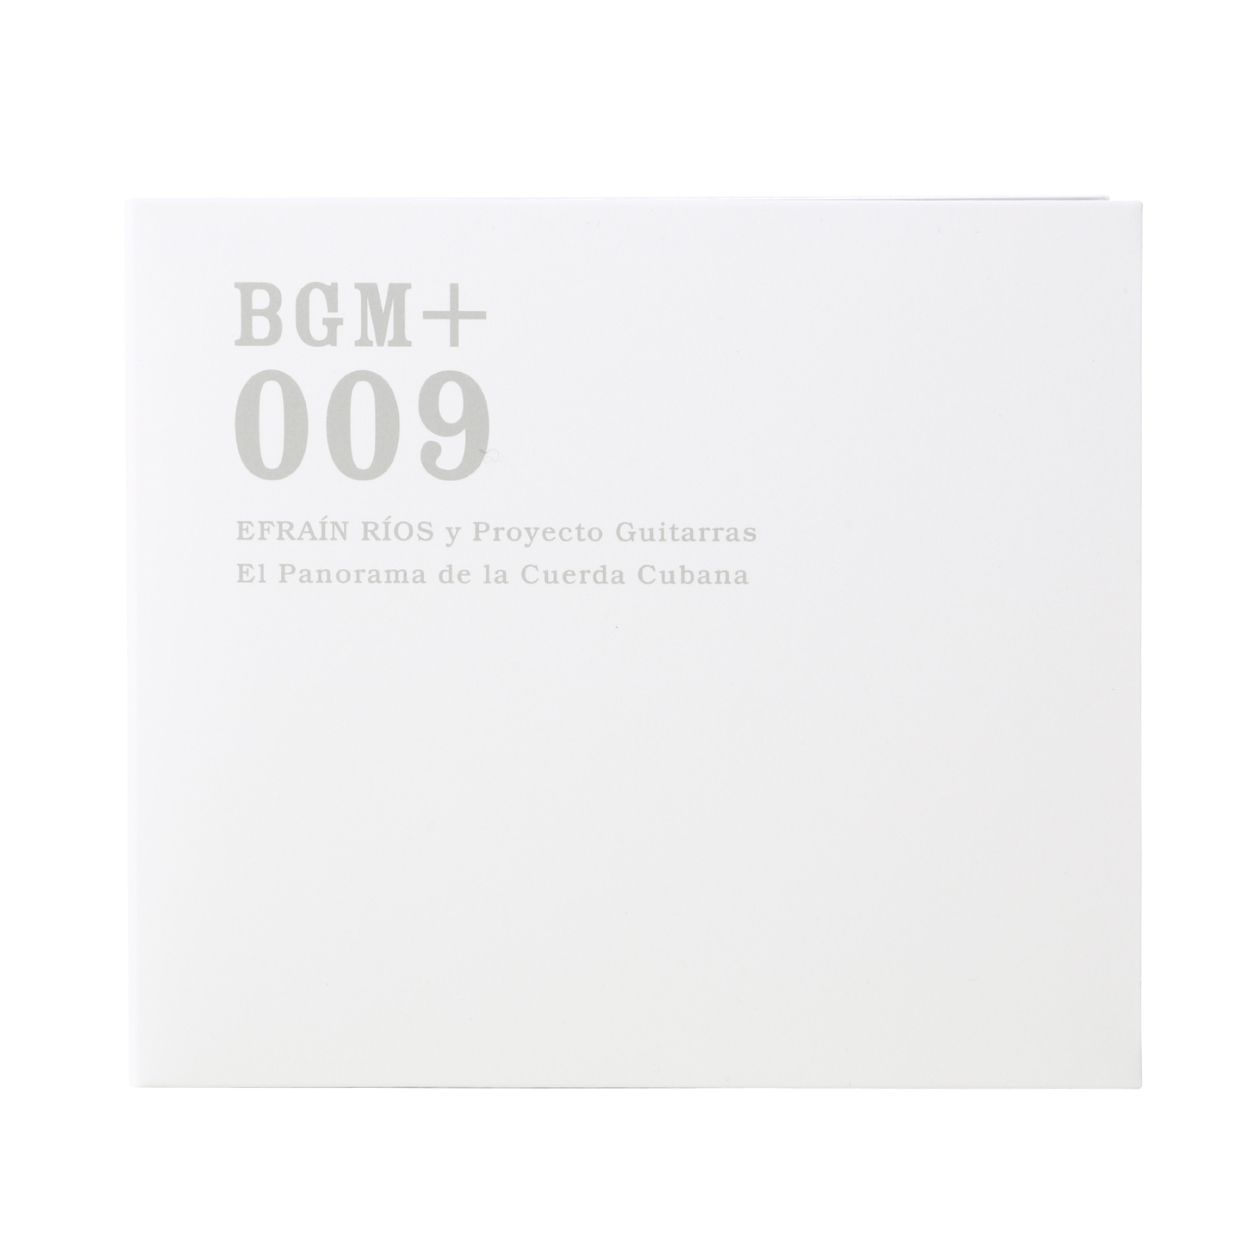 BGM+009